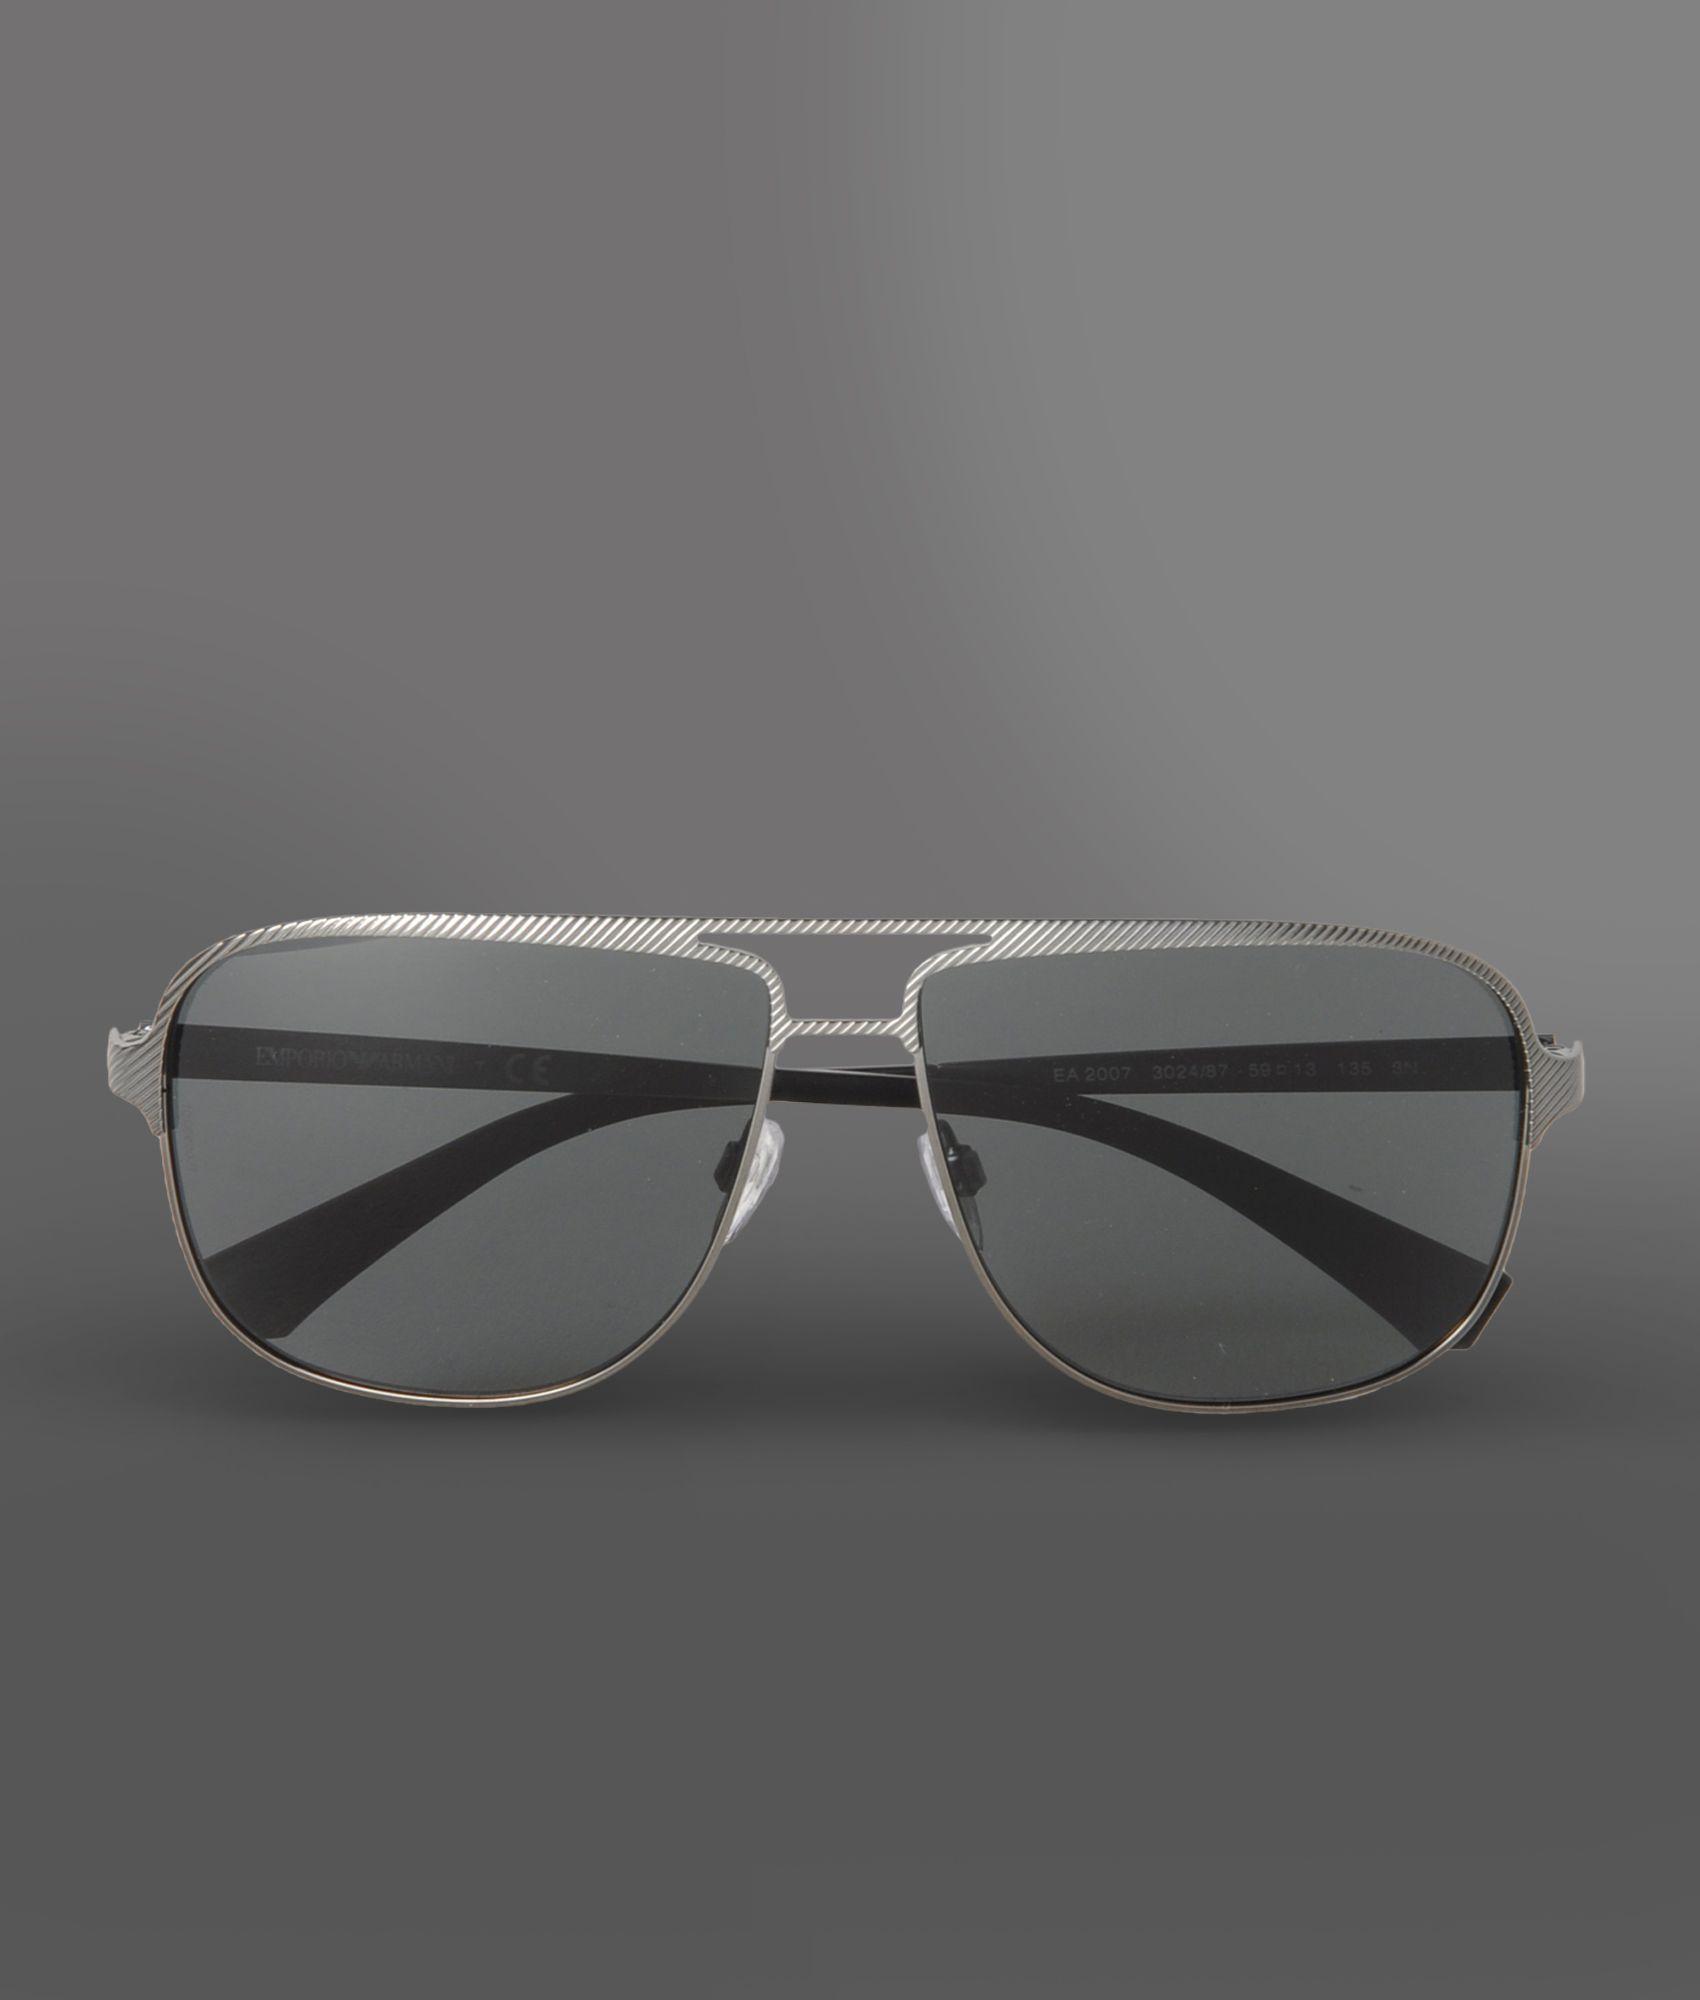 a5070f881e Cheap Armani Sunglasses China « One More Soul